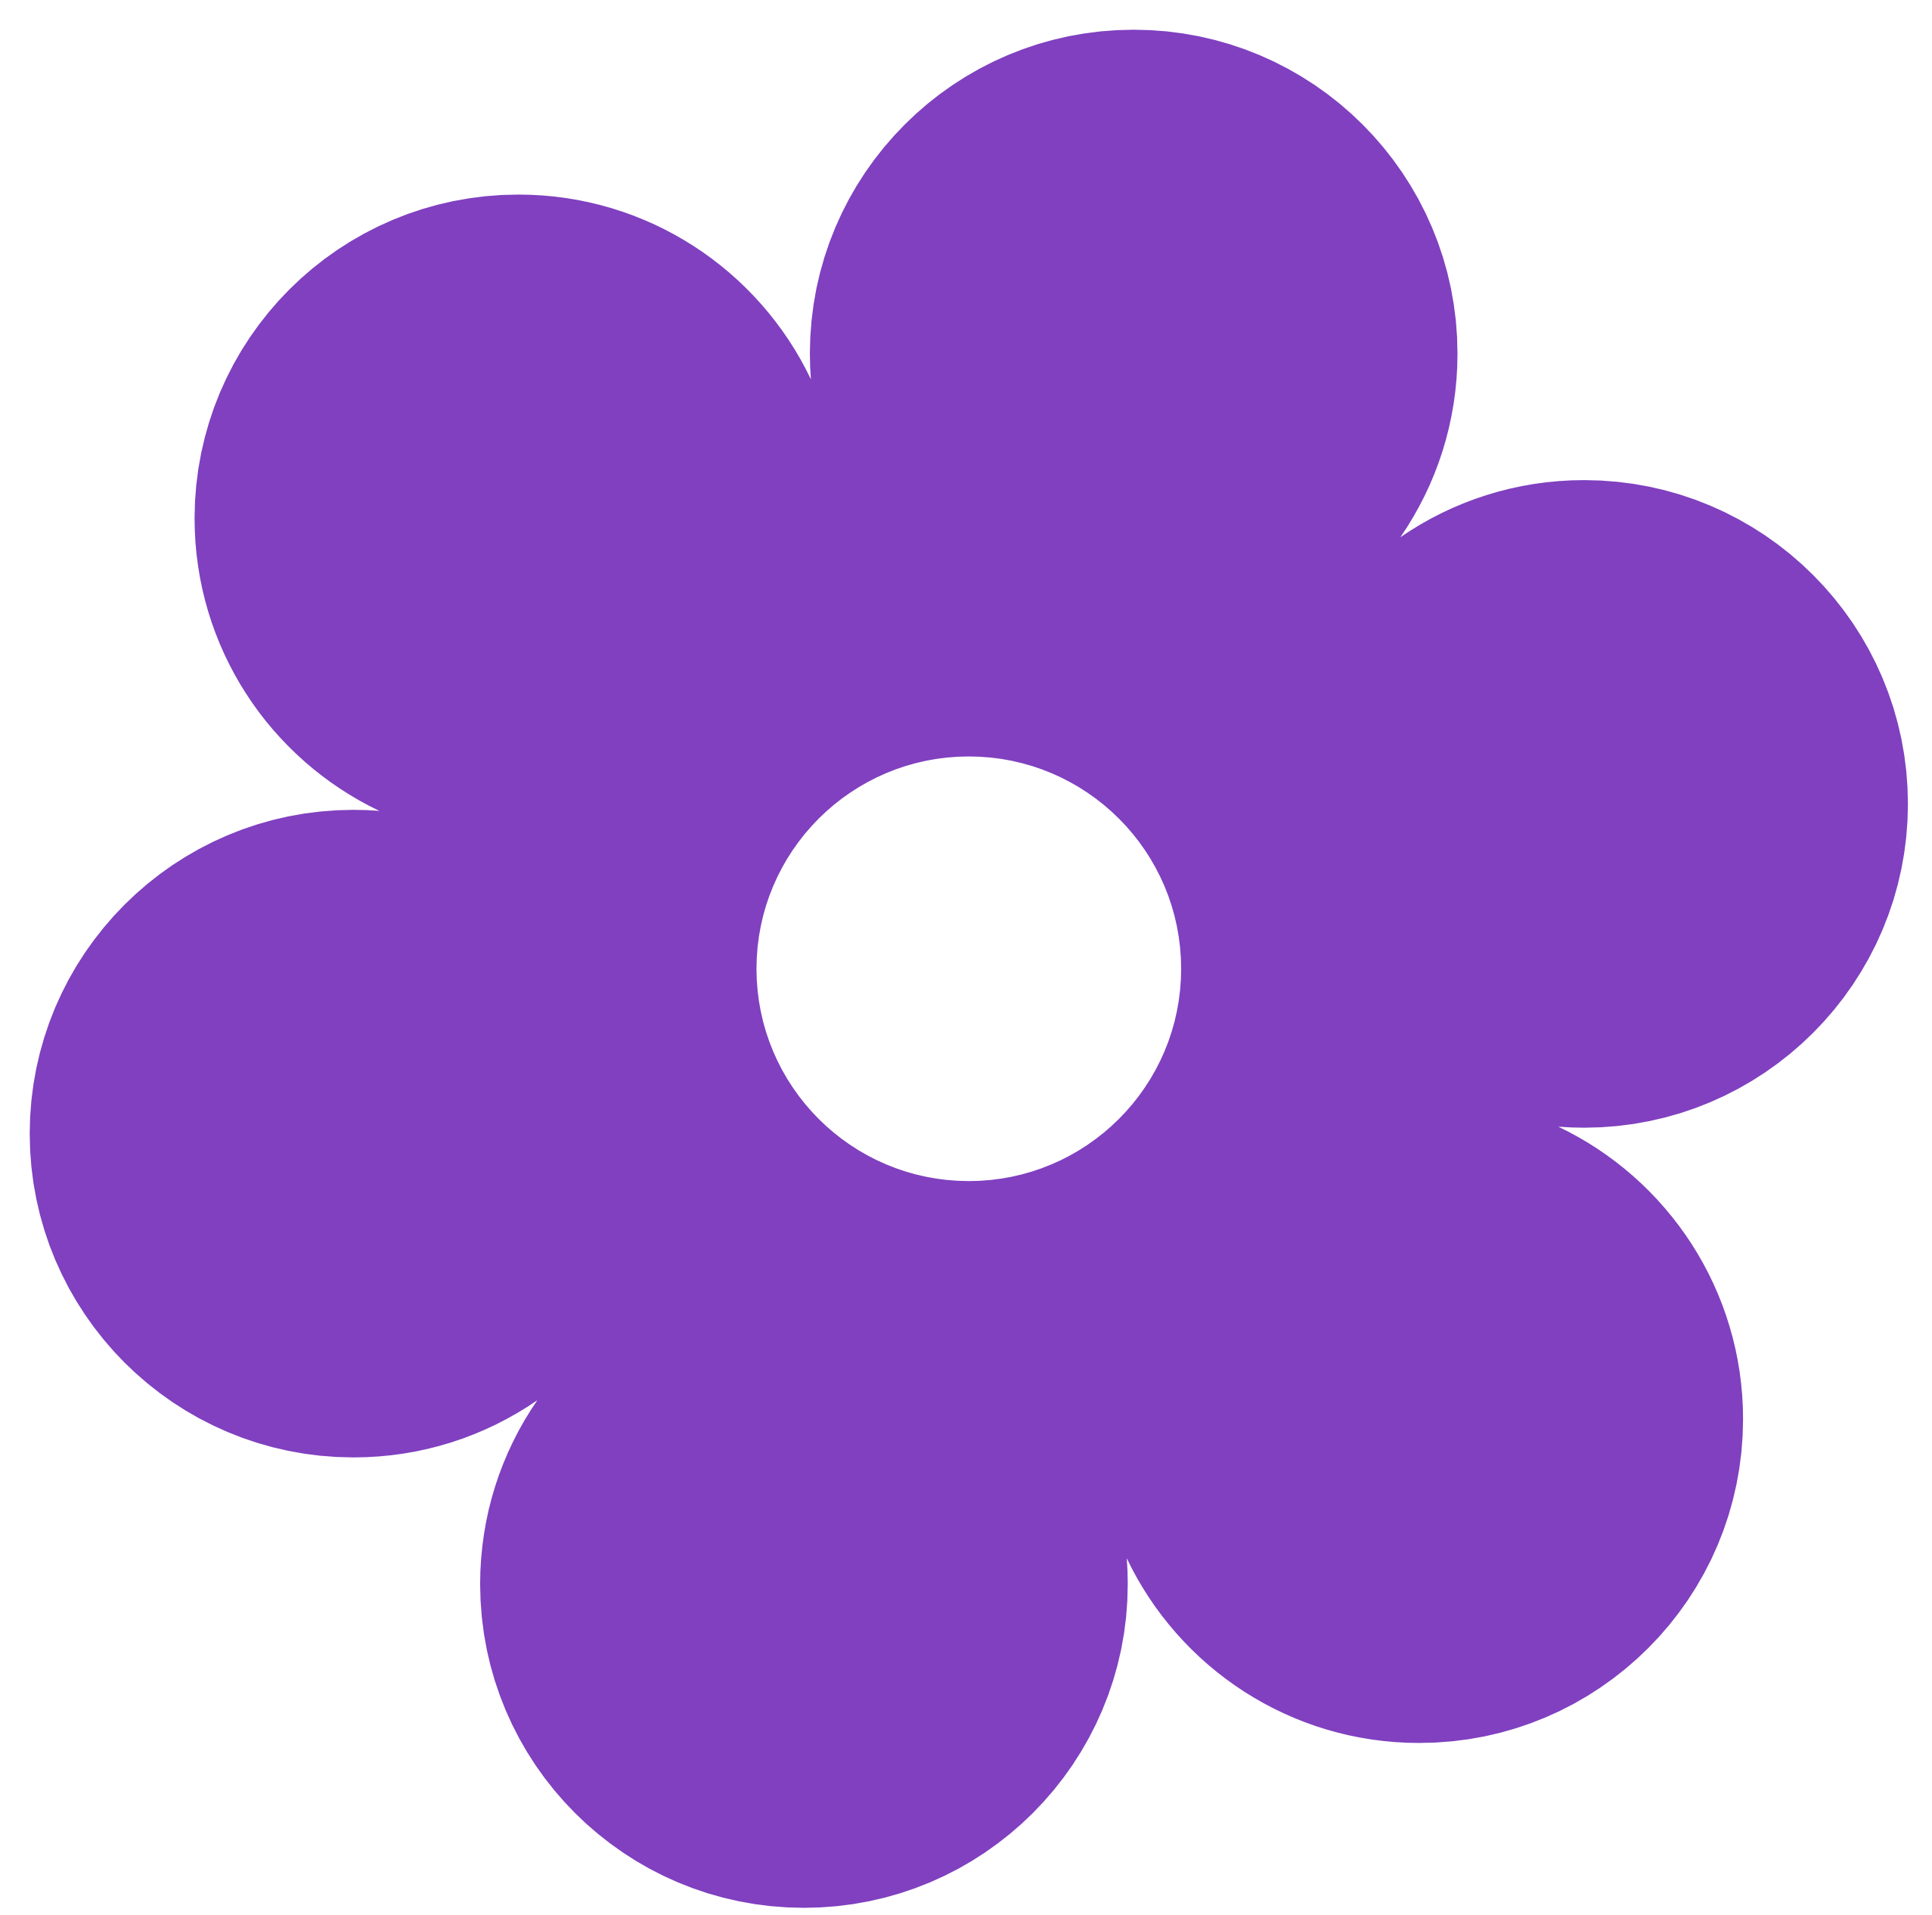 Flower In A Pot Clipart Clip Art Library Cartoon Flowers Flower Clipart Flower Collage